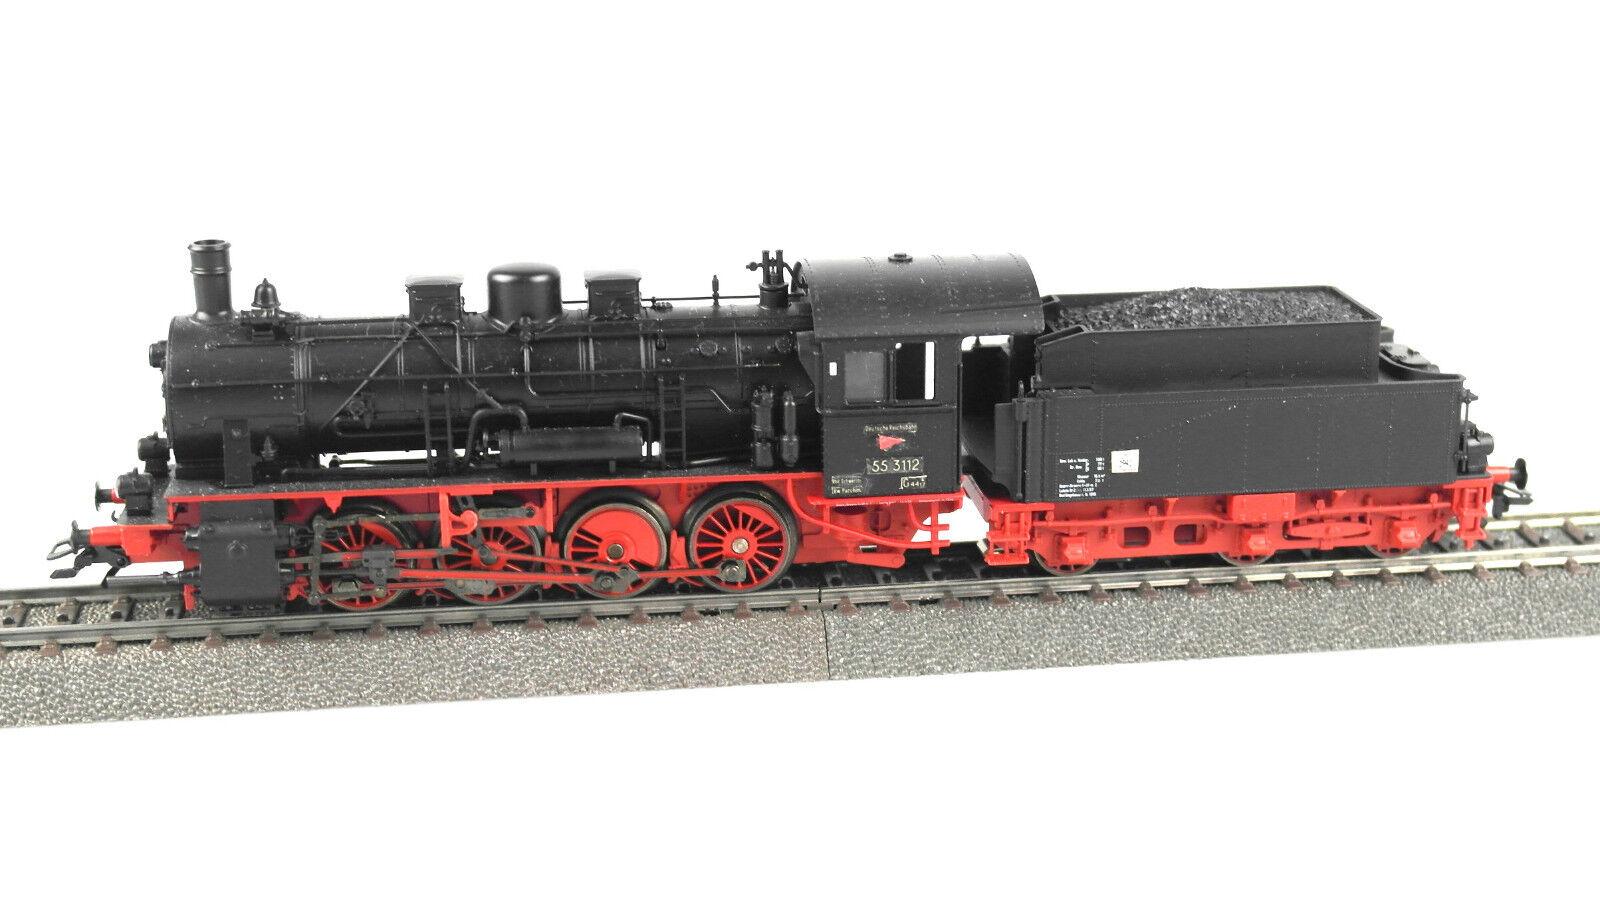 h0 29840 STILO TENDER-Locomotiva BR BR BR 55, DB, Ep. III, mfx, audio, lettura 0a1675